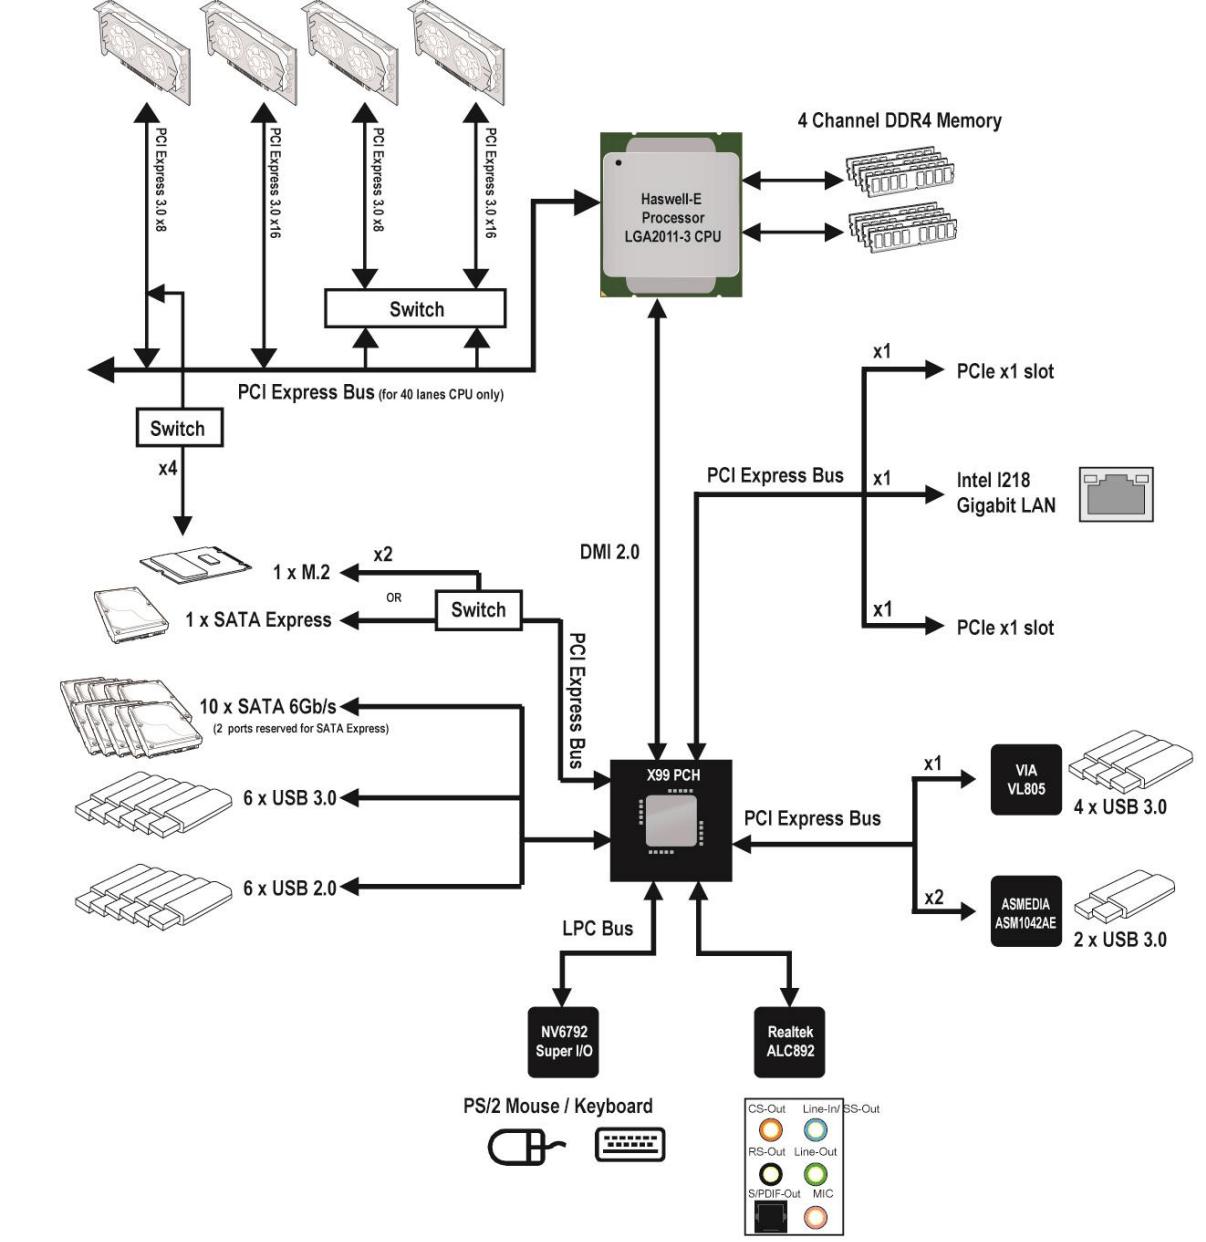 asus x99 deluxe diagram